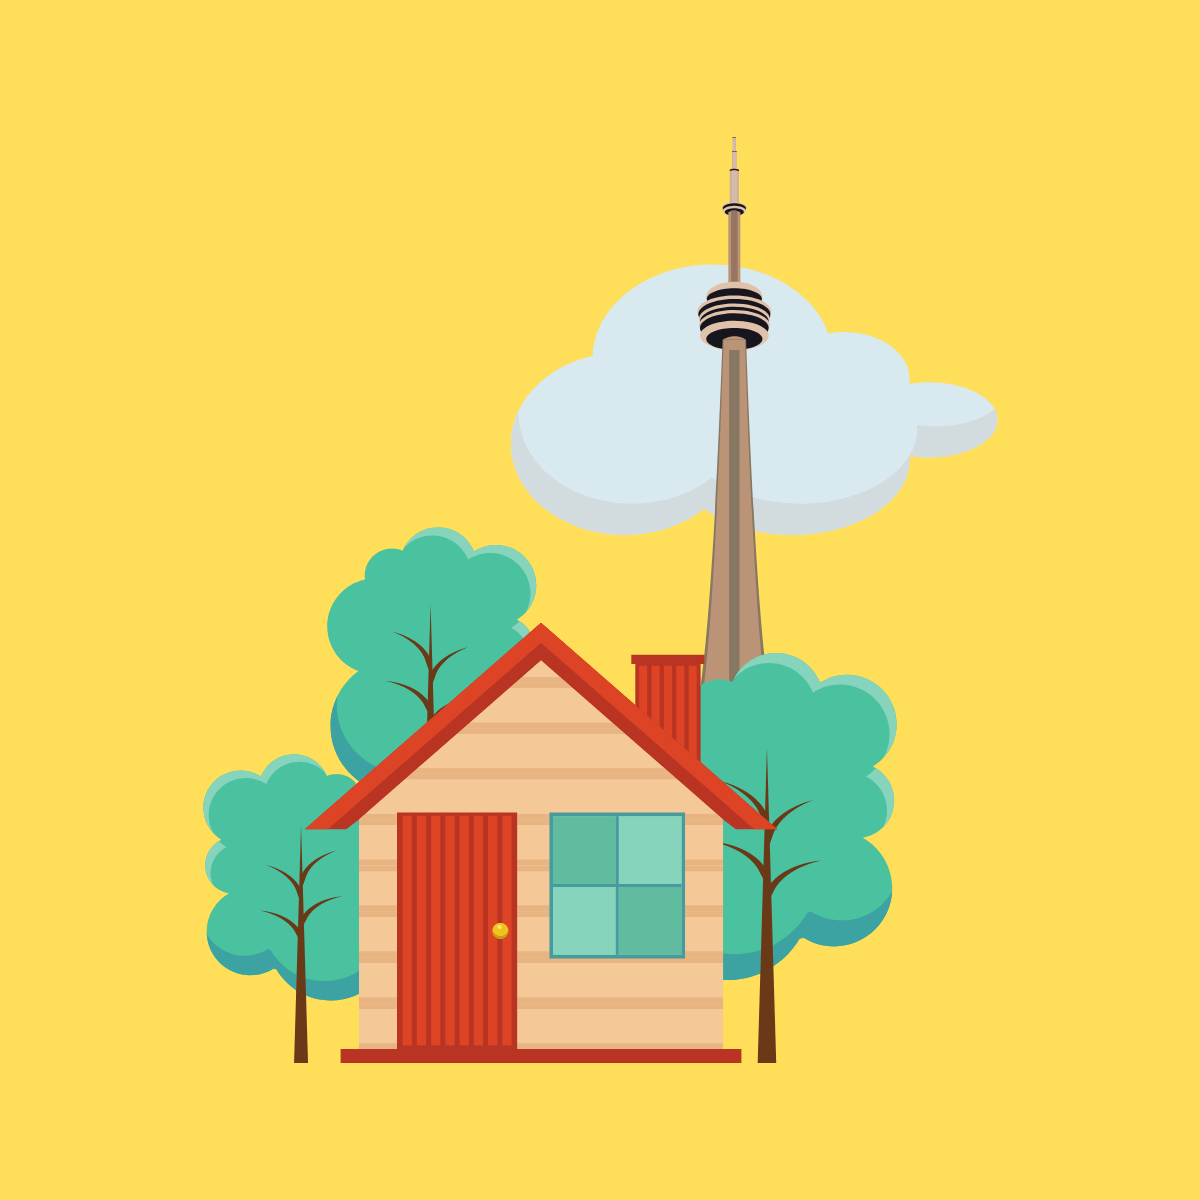 Average Home Prices In Toronto 2021